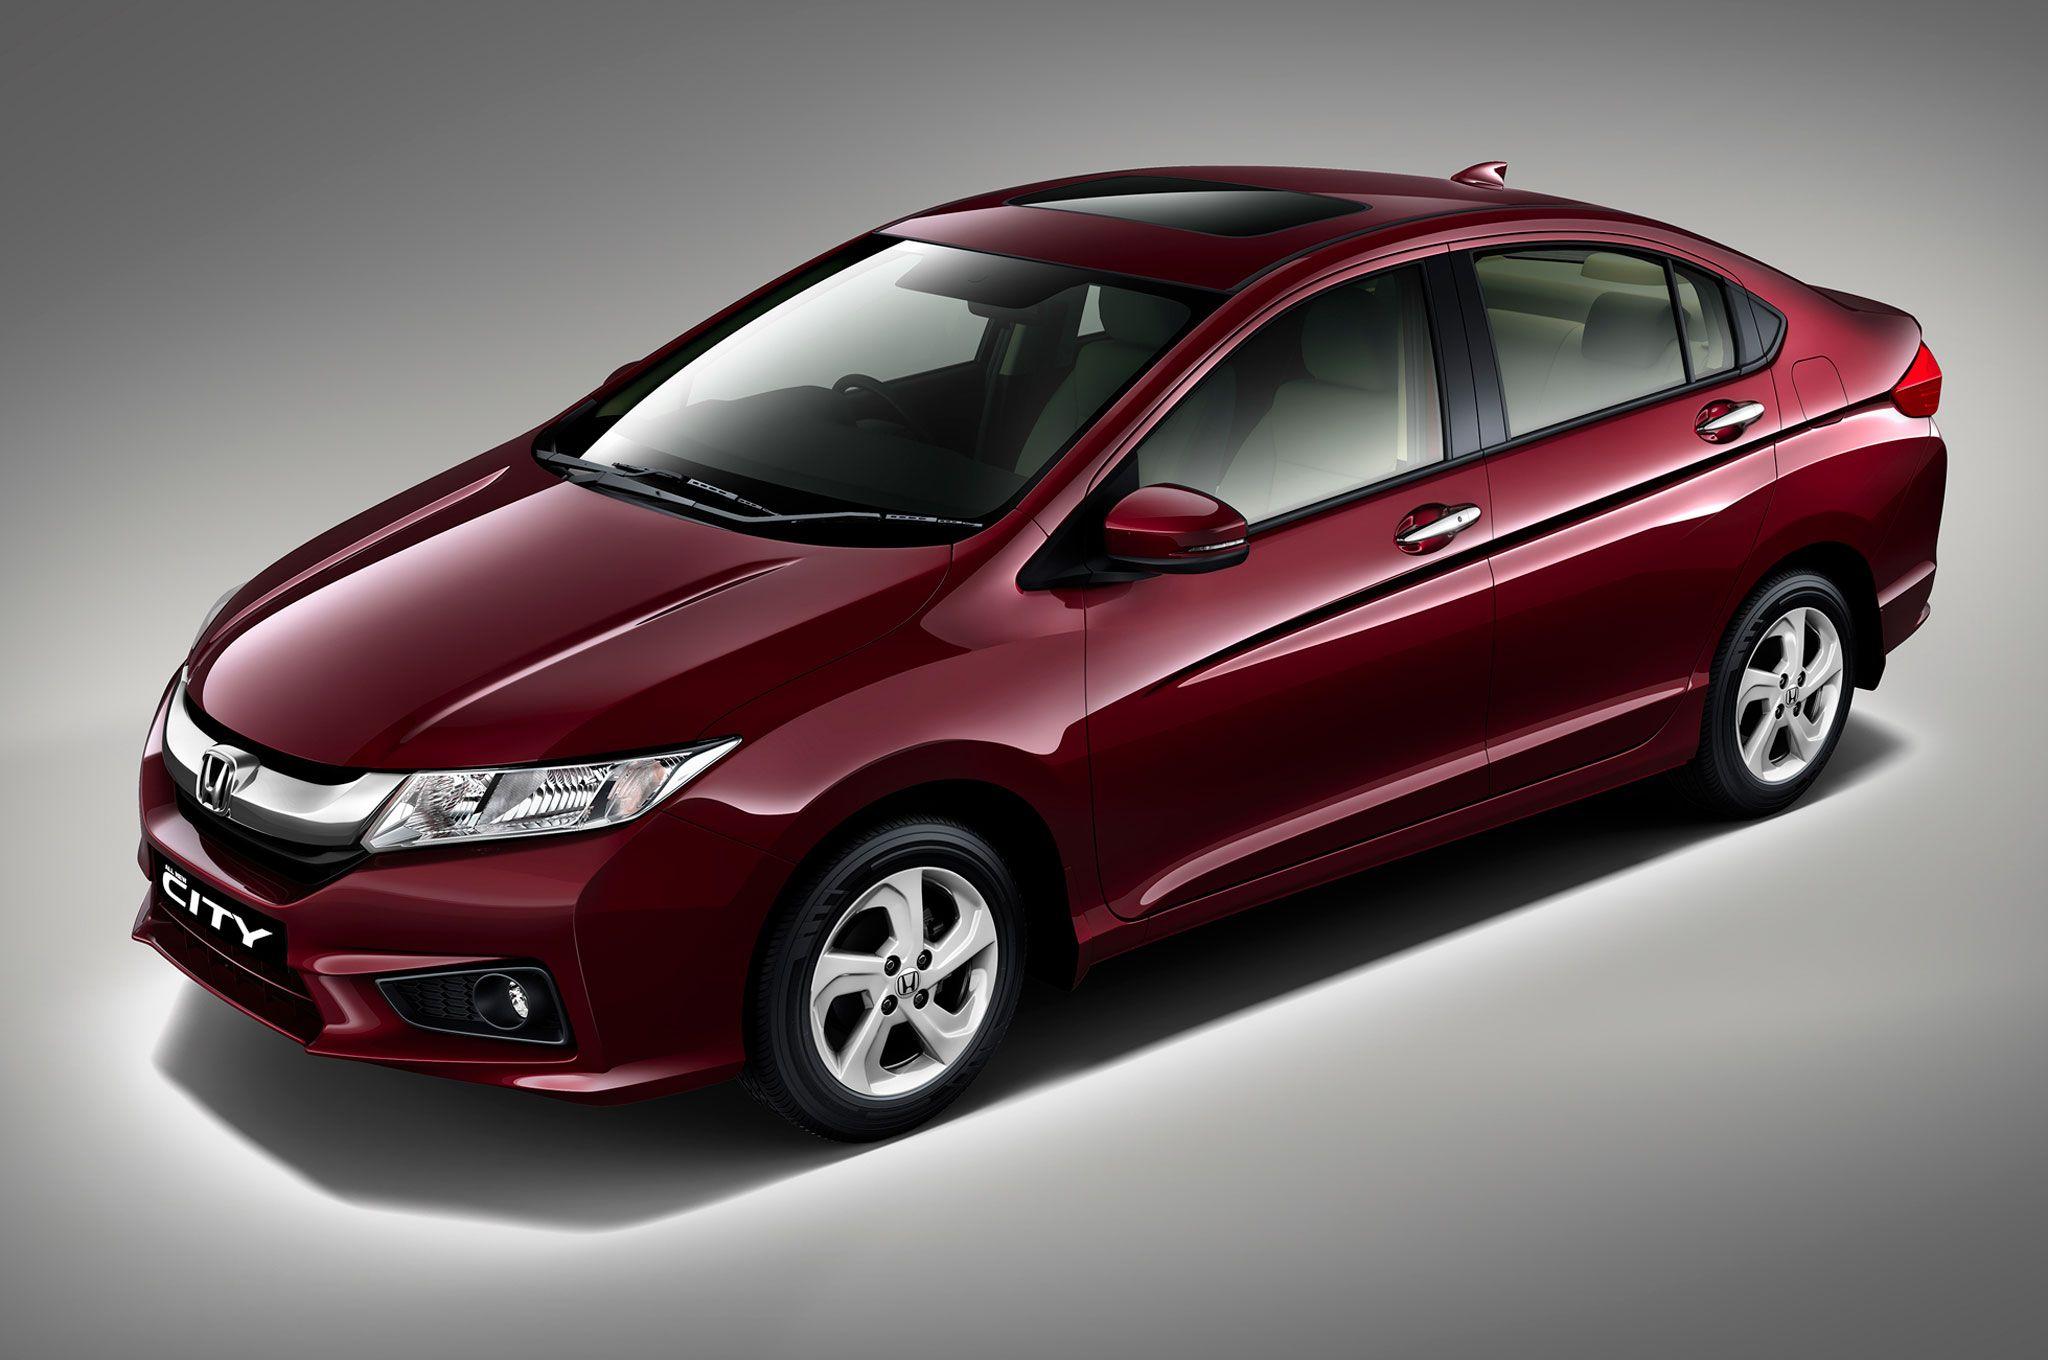 new car release dates 2014 in indiaHonda City 2015  Honda Wallpapers  Pinterest  Cars Honda and